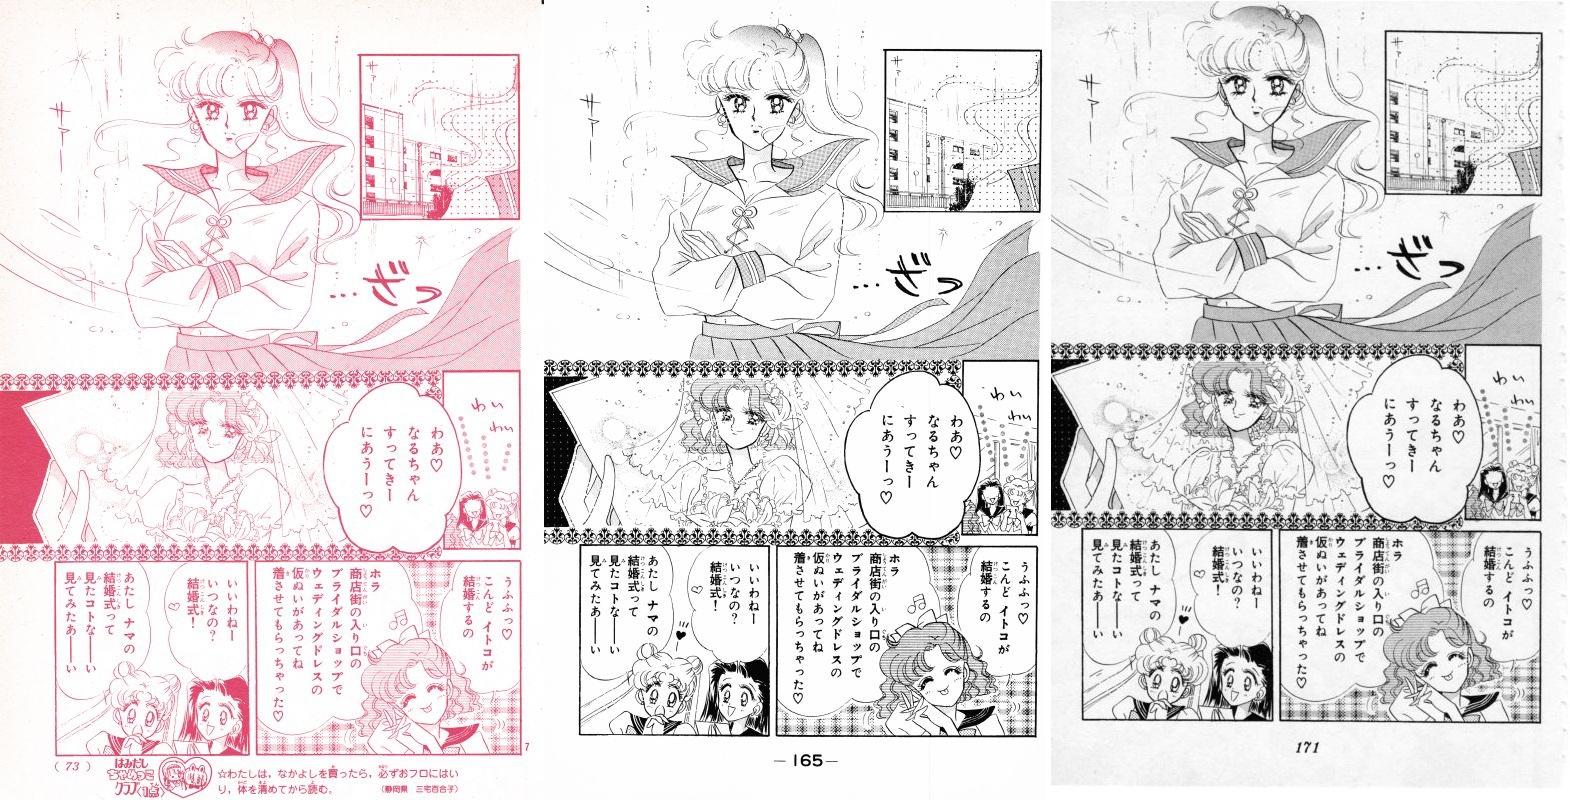 Act 5, Page 5 – Nakayoshi, Original, Remaster